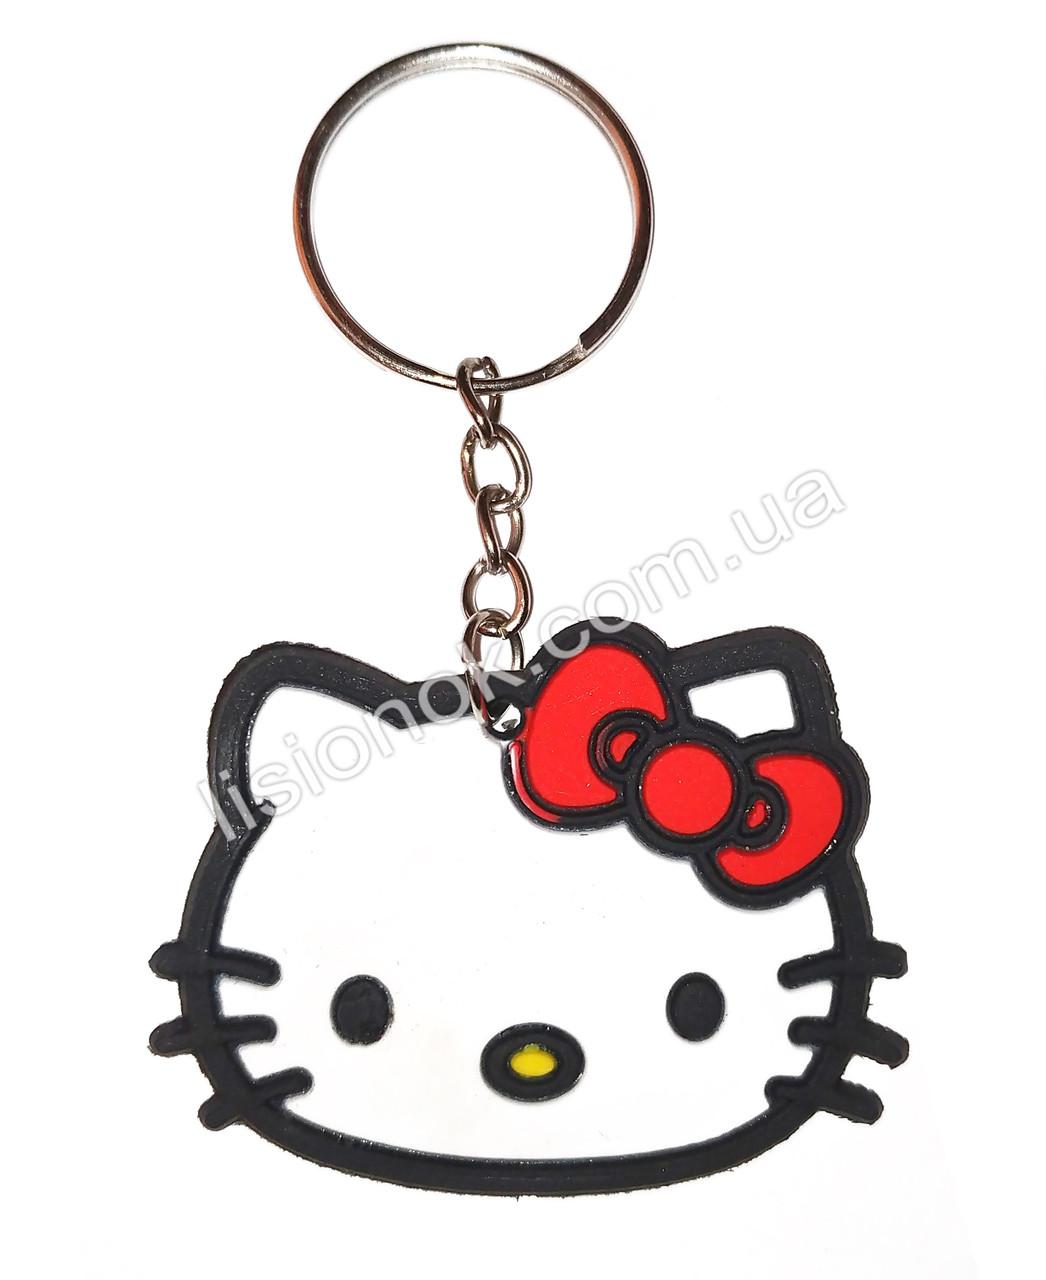 Брелок Hello Kitty подвеска, игрушка - стильный аксессуар